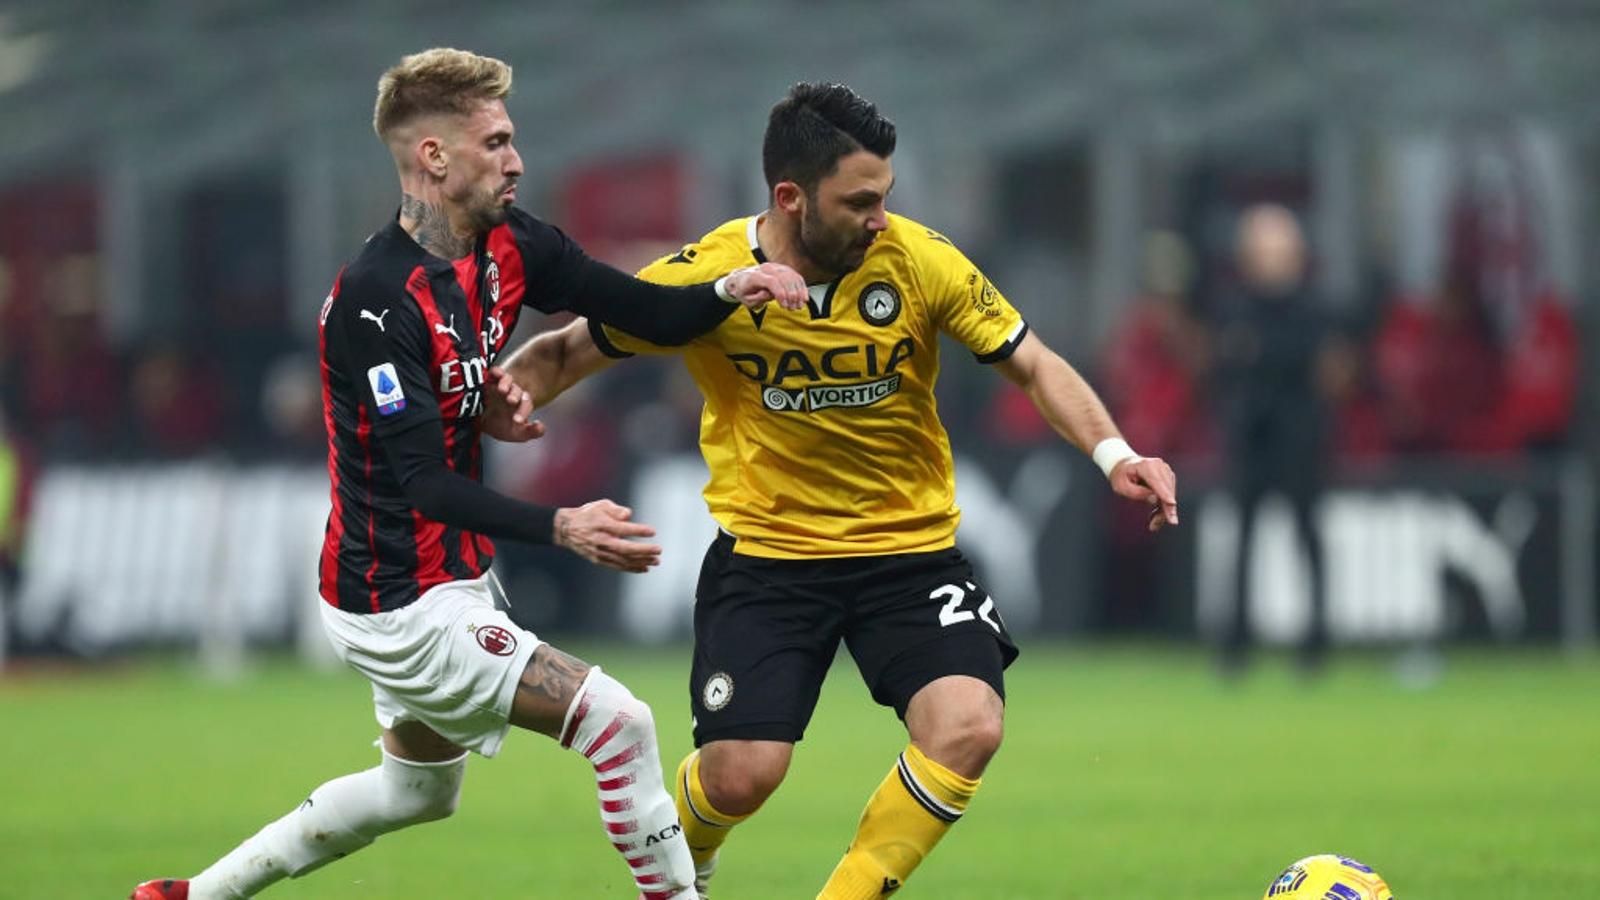 Milan - Udinese 1-1 - Calcio - Rai Sport